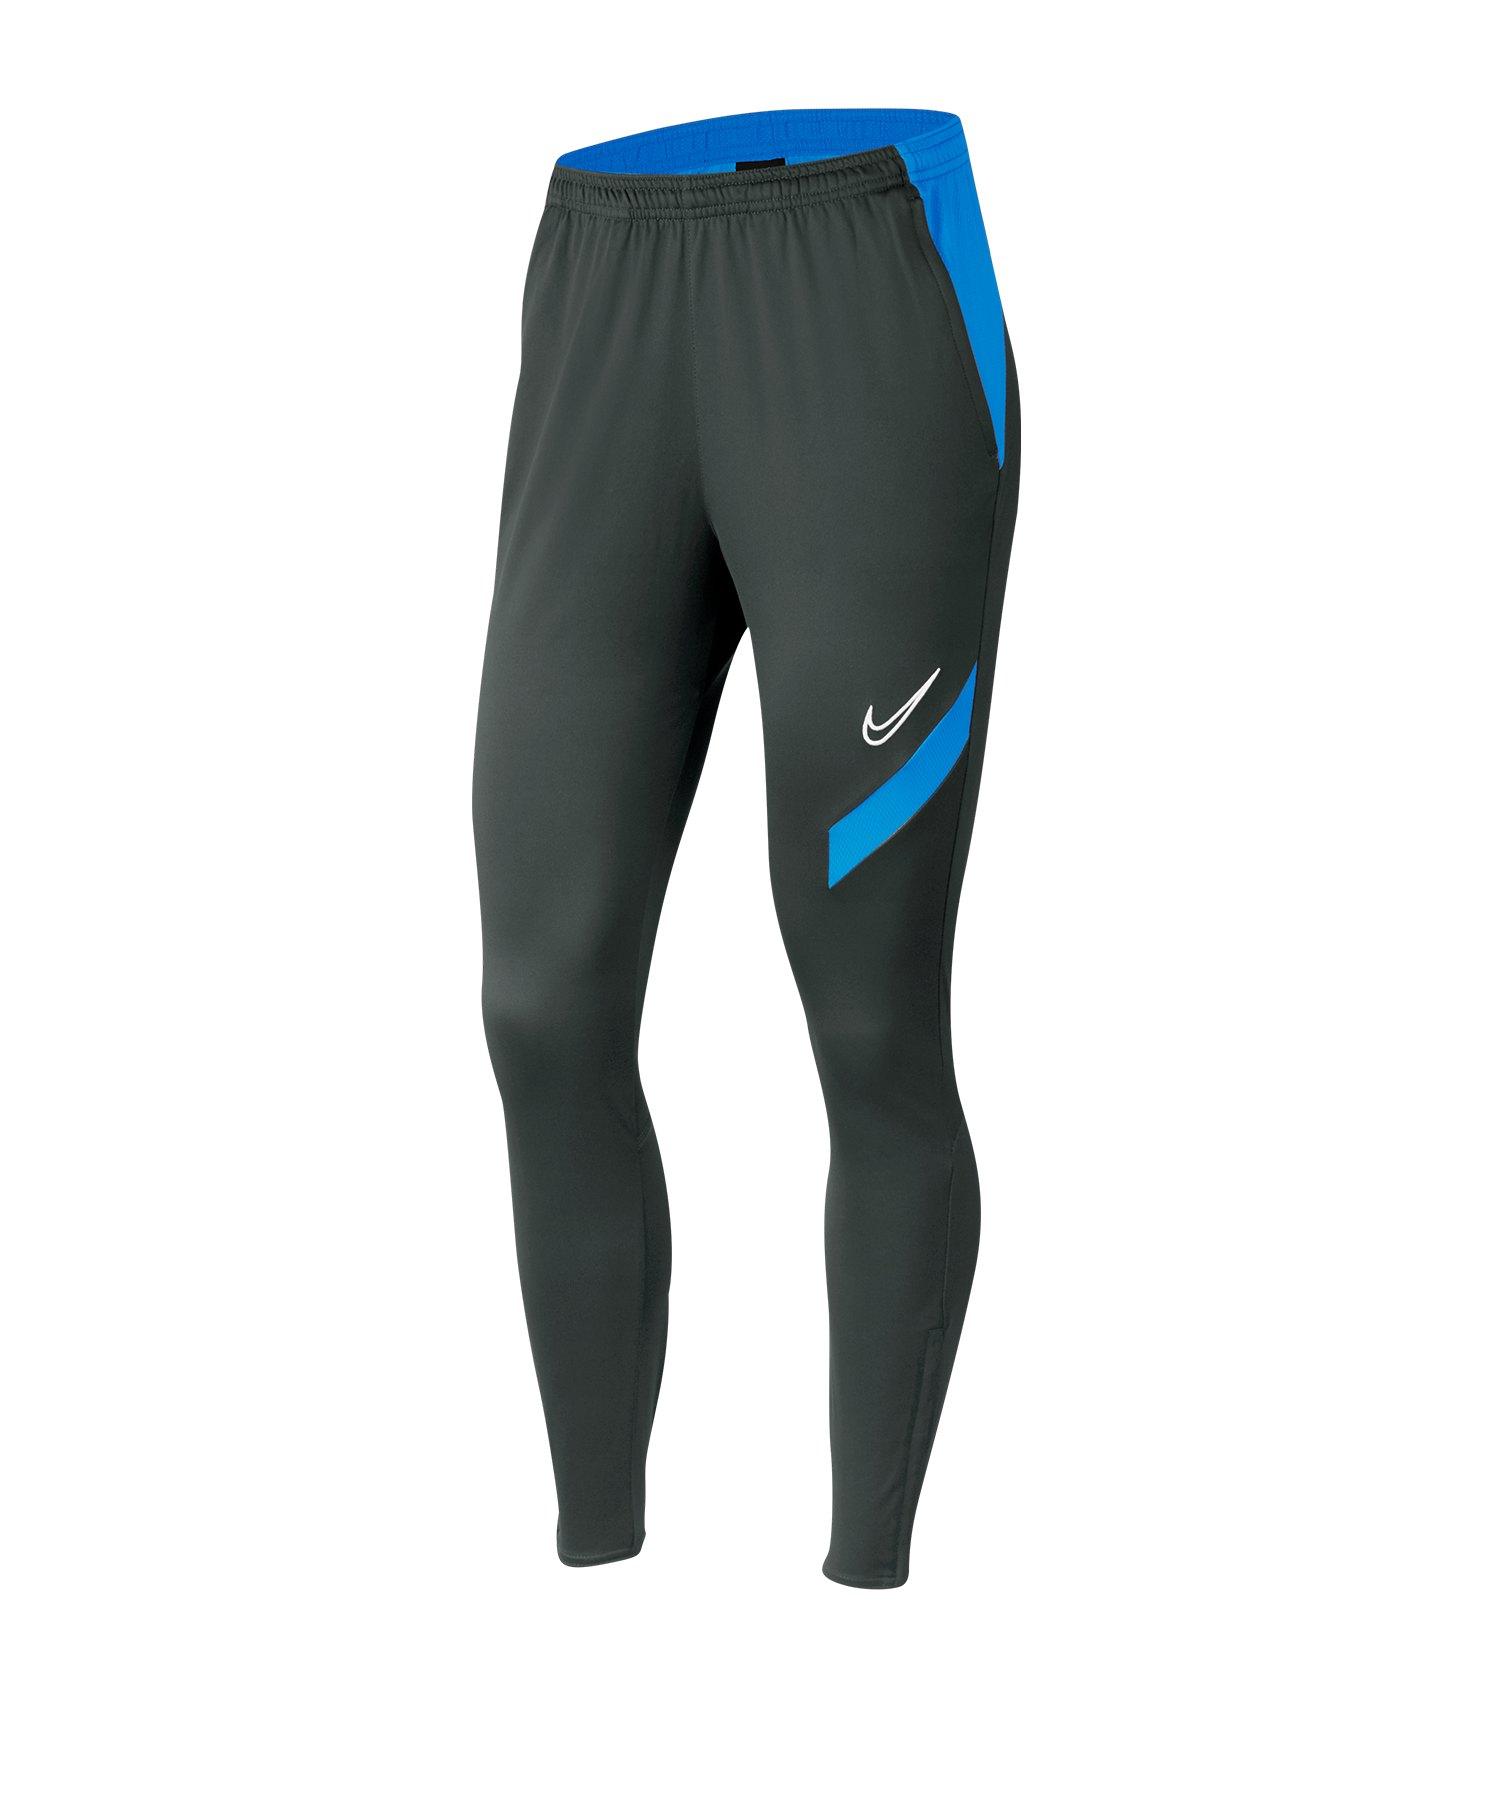 Nike Academy Pro Trainingshose Damen F060 - grau